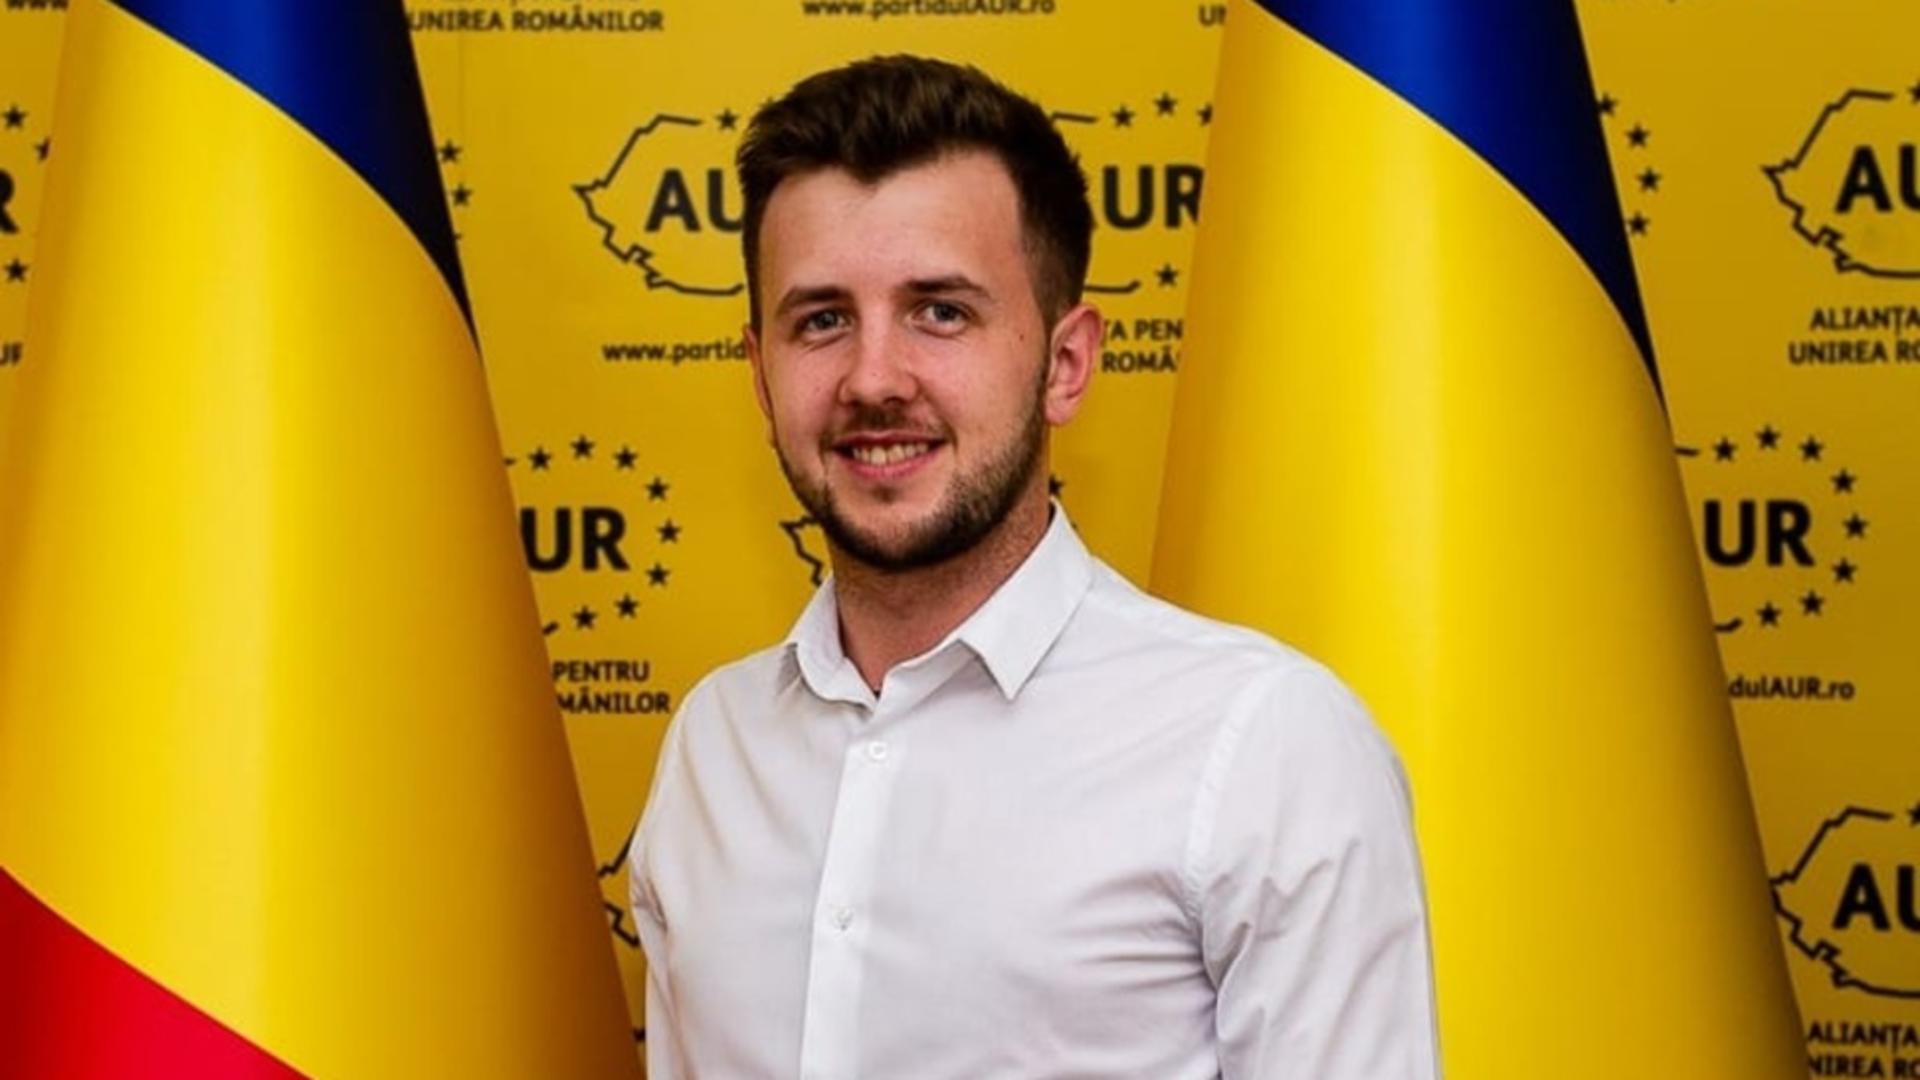 Balabașciuc Călin-Constantin